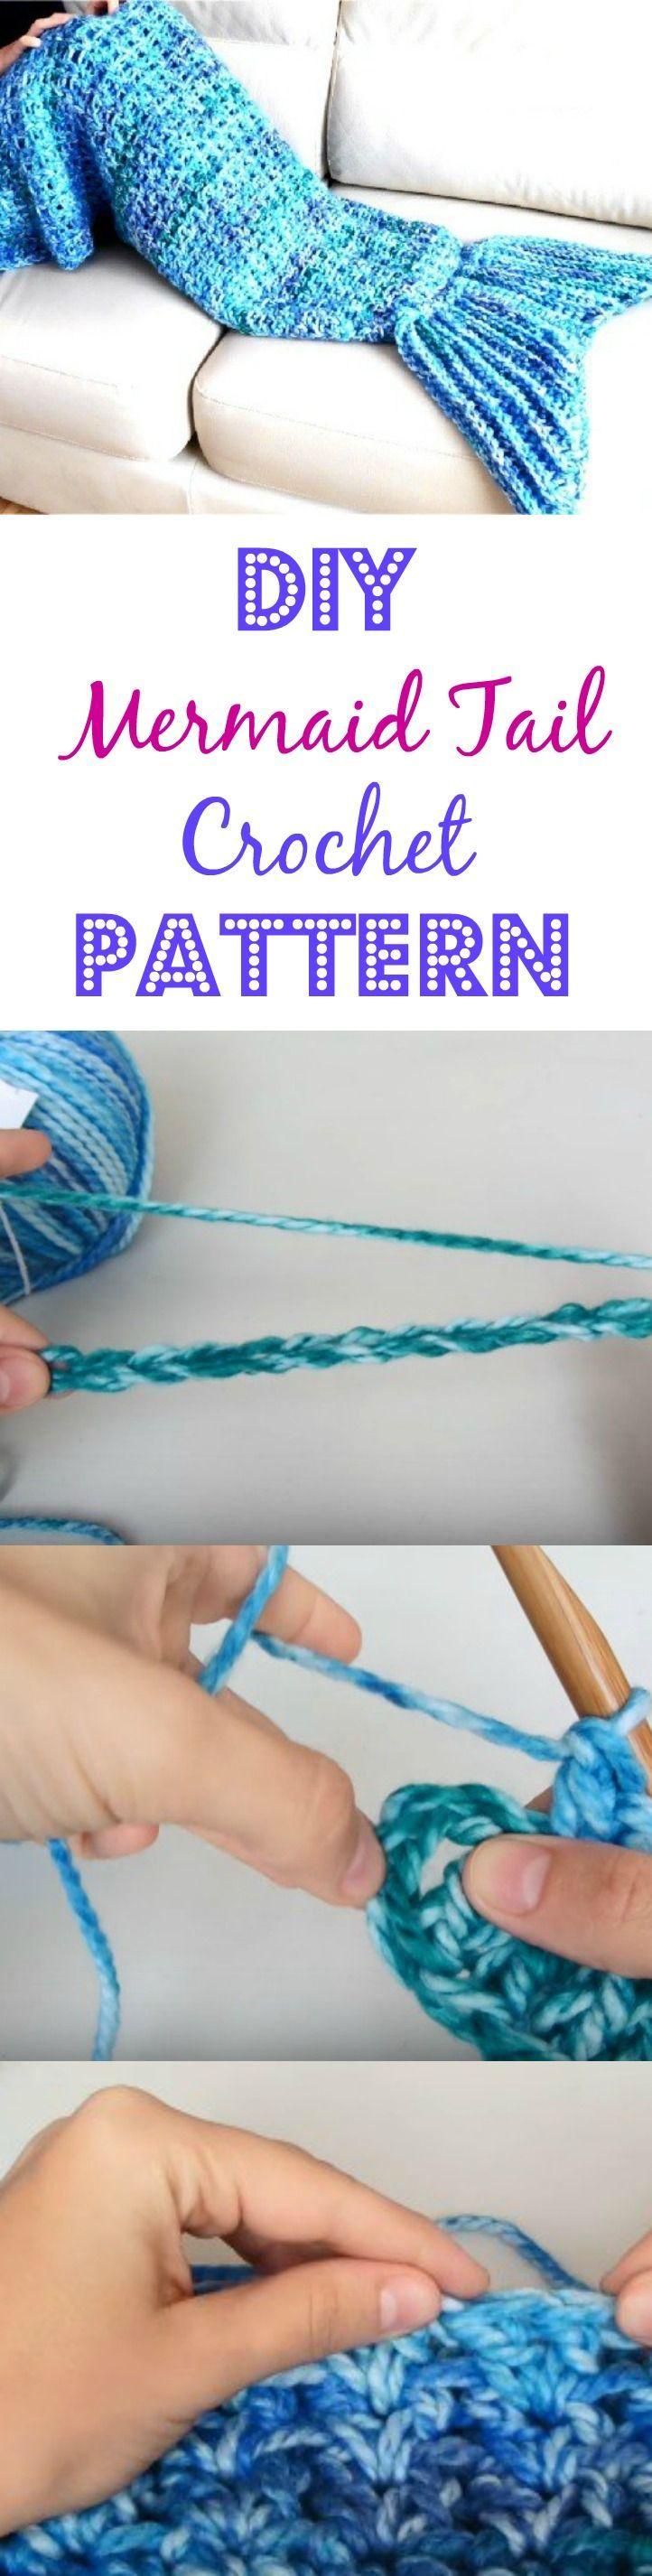 Easy diy mermaid tail crochet pattern ideas diy mermaid tail easy diy mermaid tail crochet pattern ideas bankloansurffo Choice Image